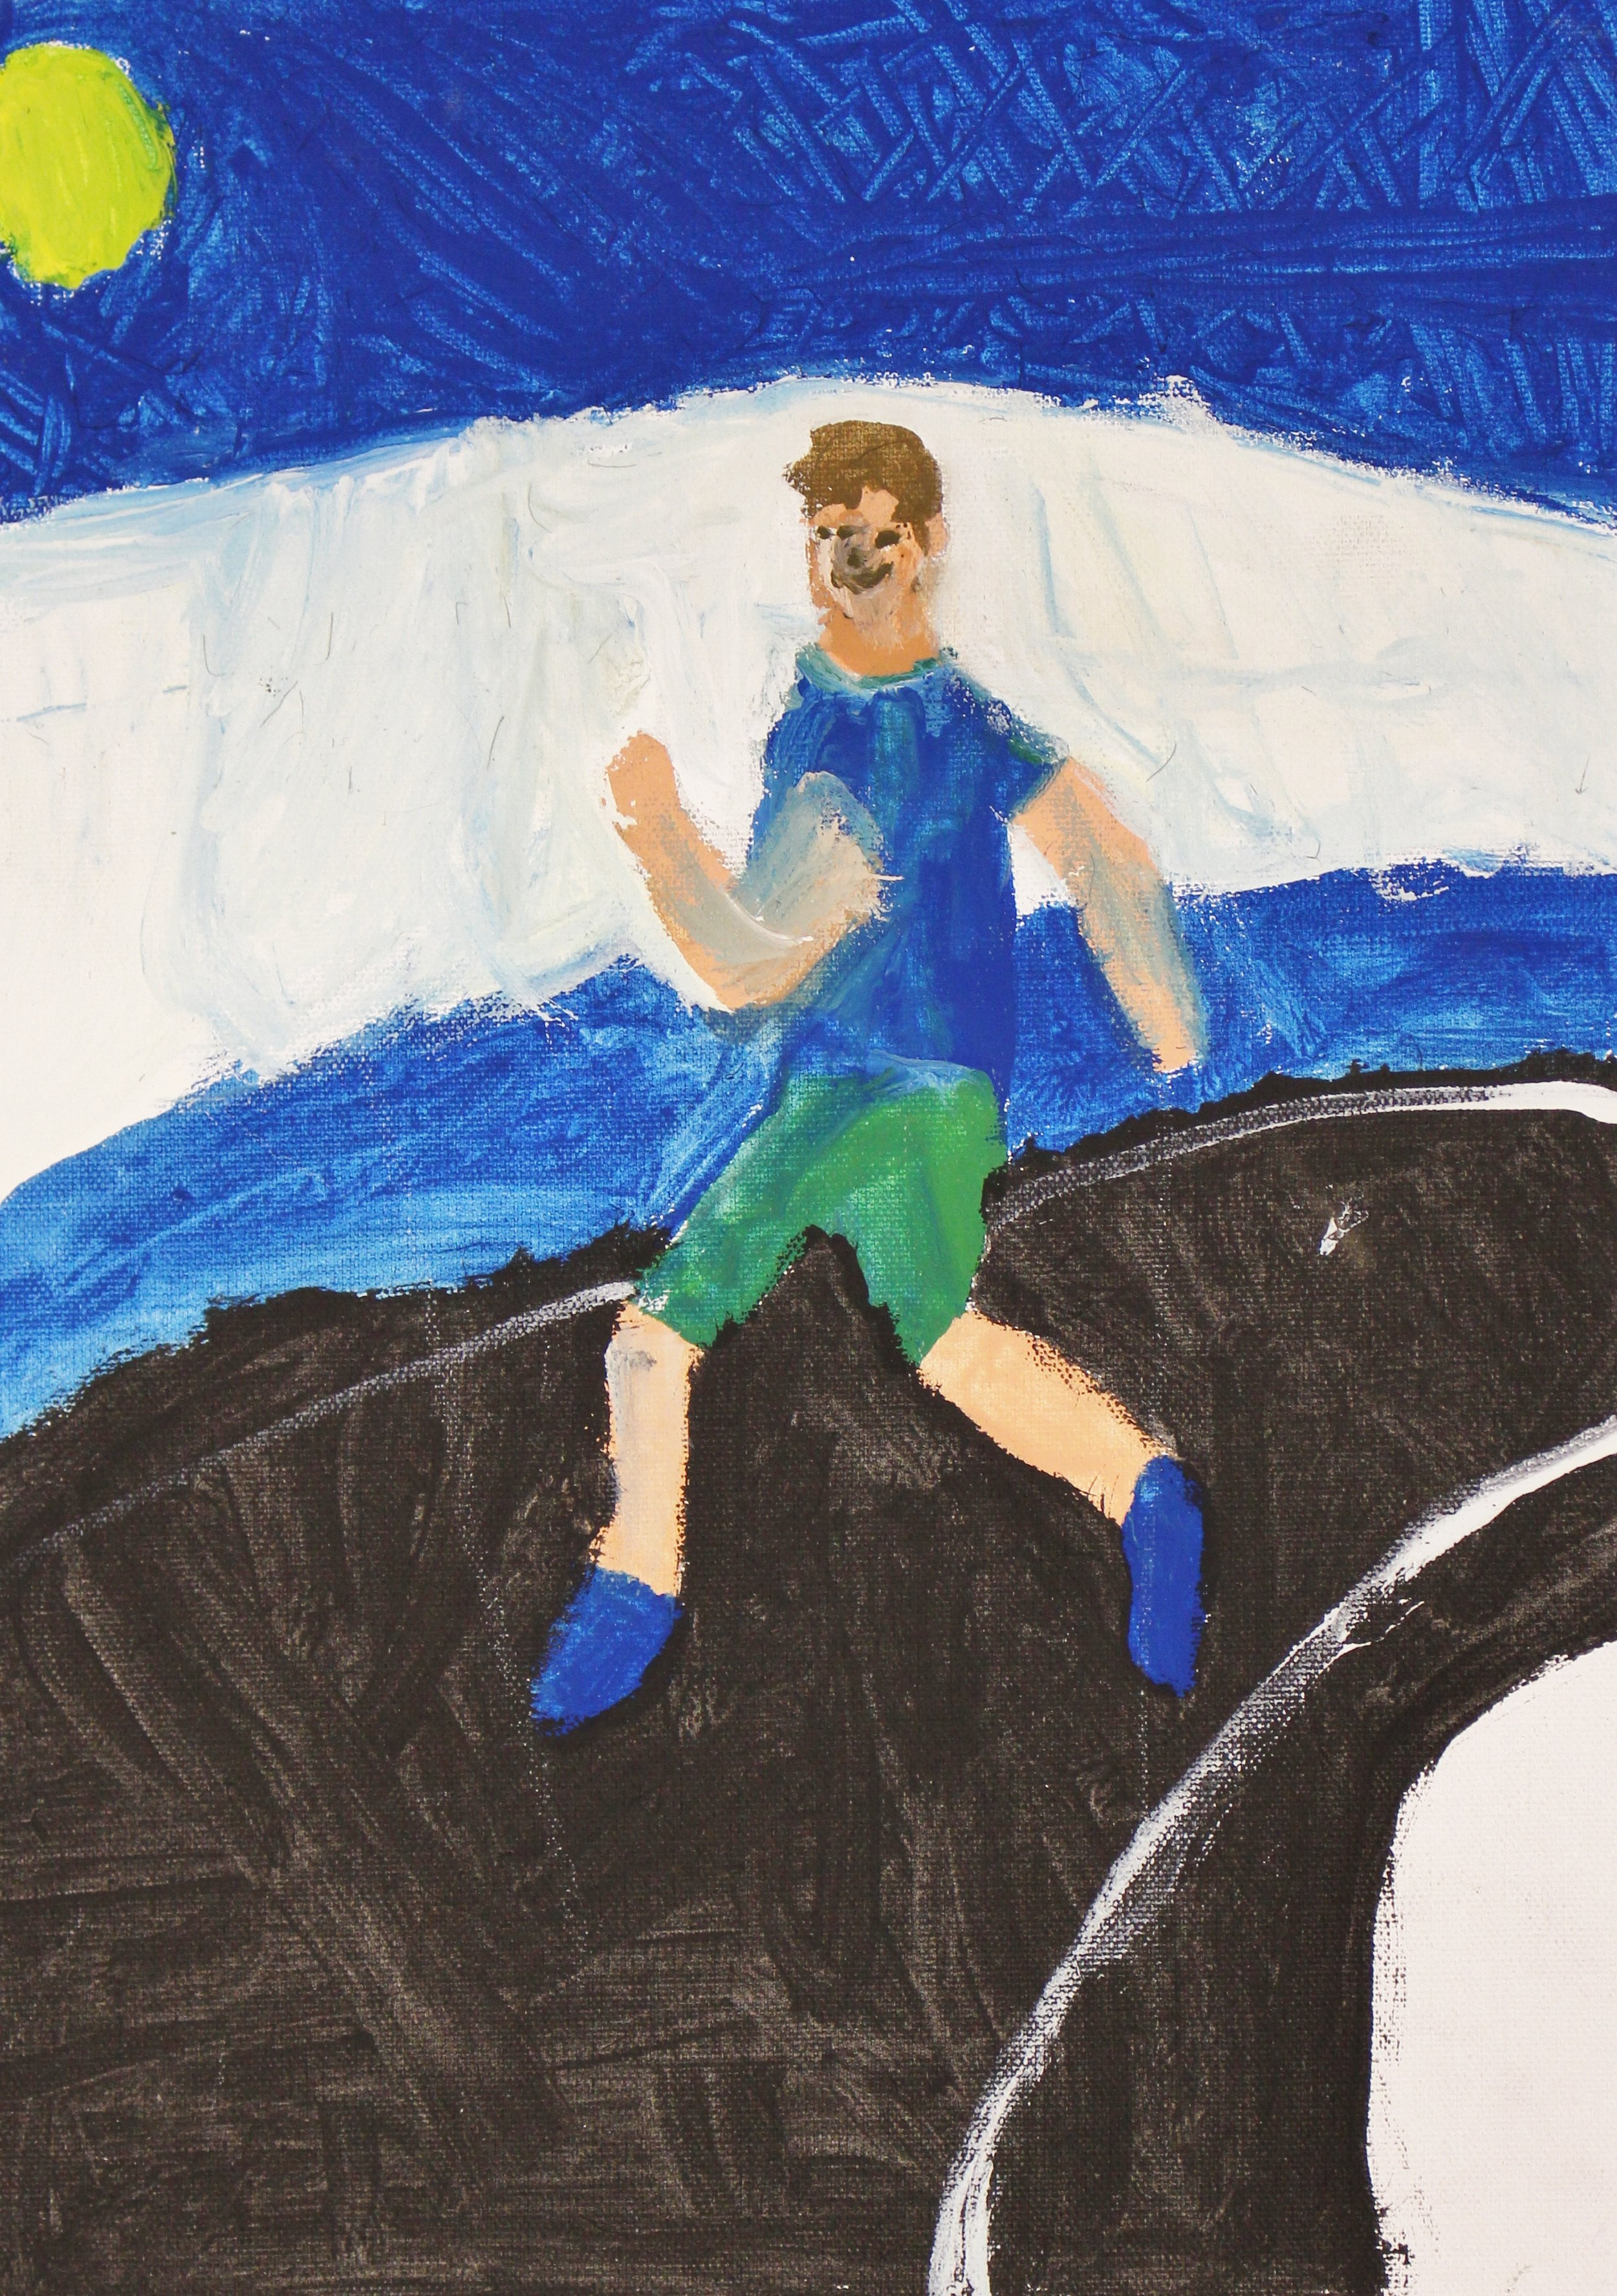 5th Grade: Owen Rathfon (Olympic Athlete in Motion)